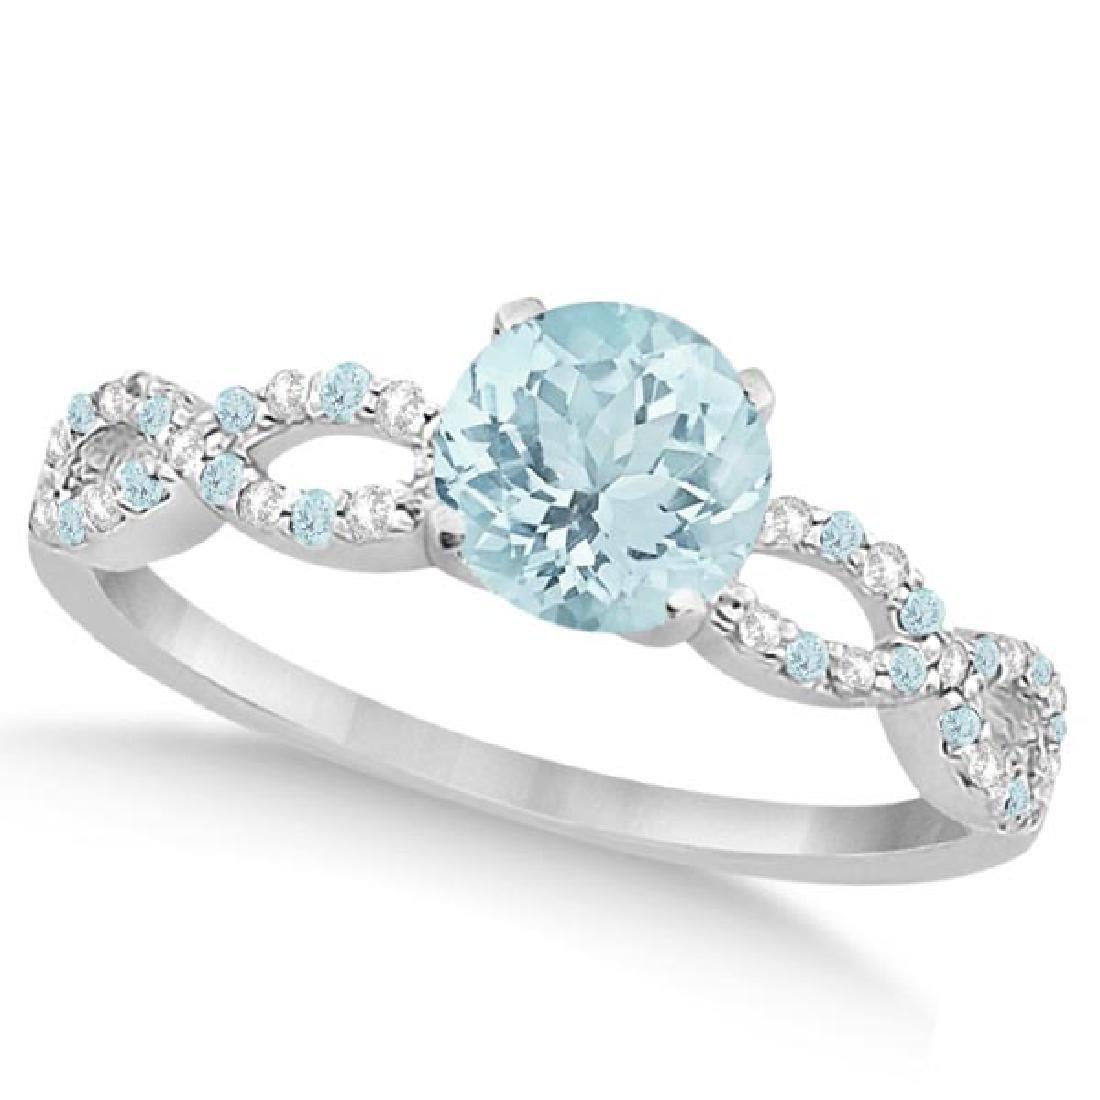 Diamond and Aquamarine Infinity Engagement Ring 14K Whi